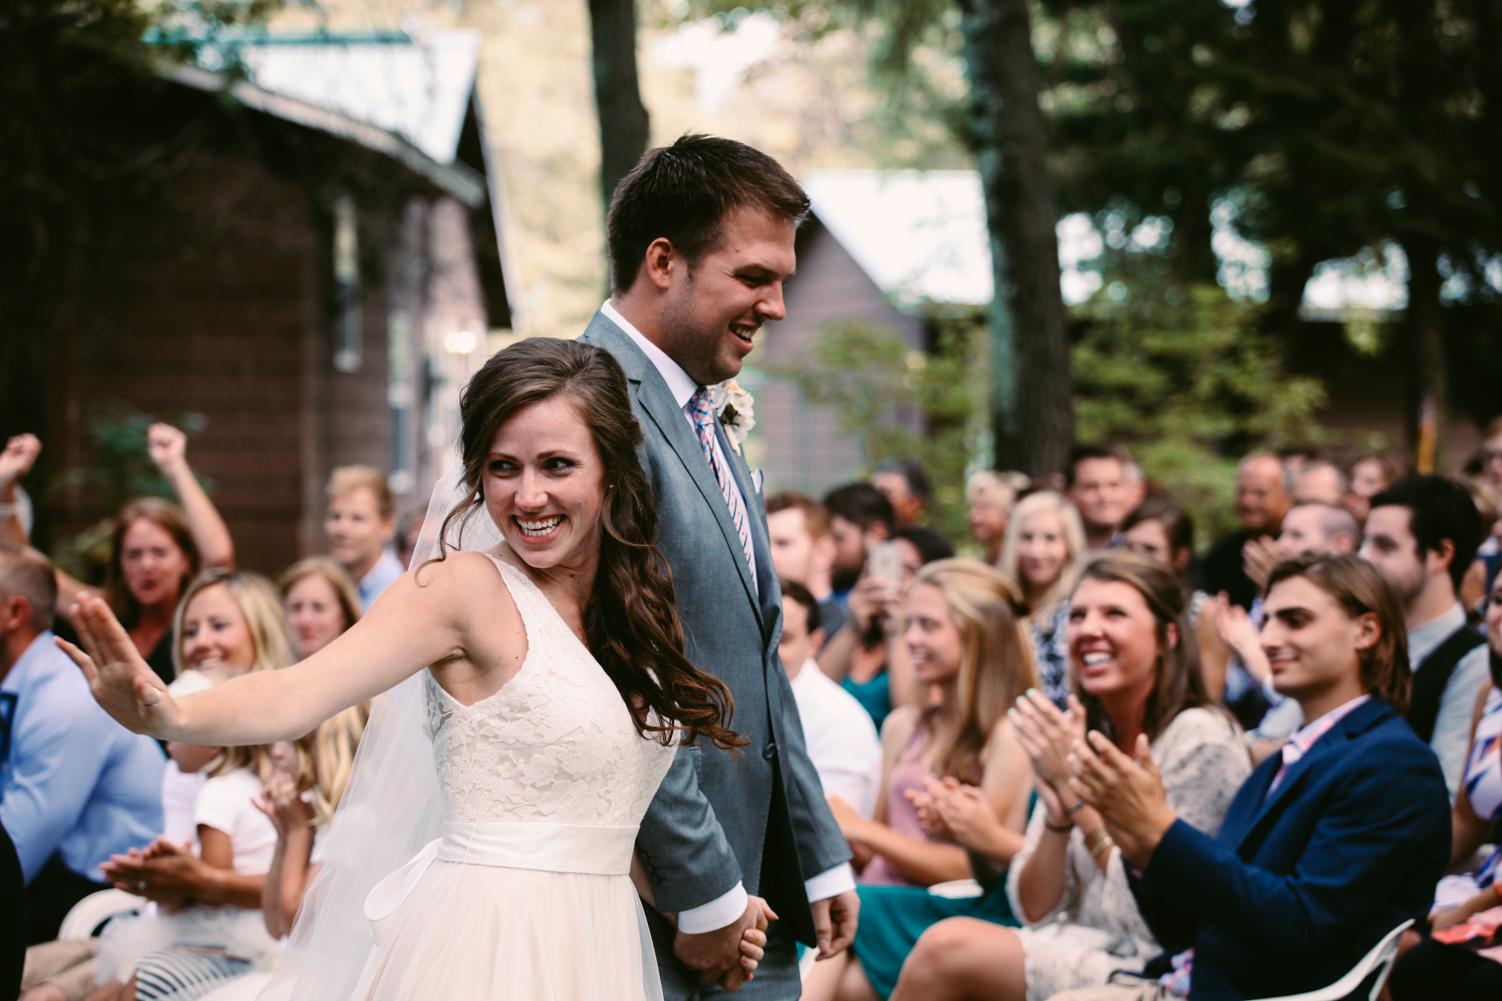 heartfelt-wedding-photographer-minnesota-1-6.jpg